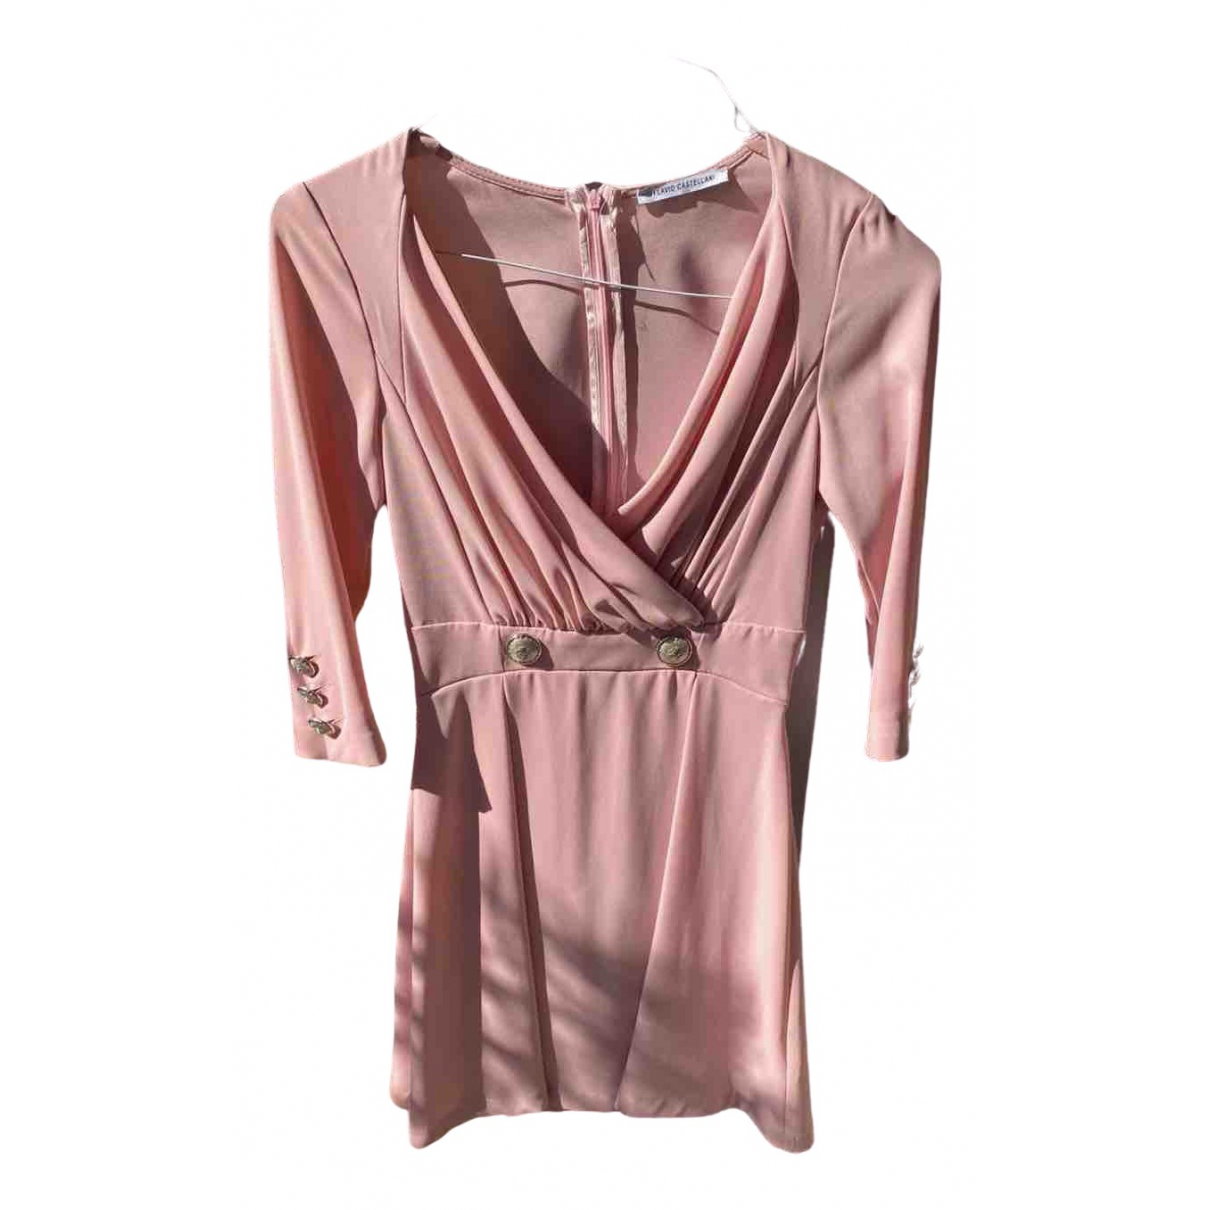 Flavio Castellani \N Pink skirt for Women 38 IT